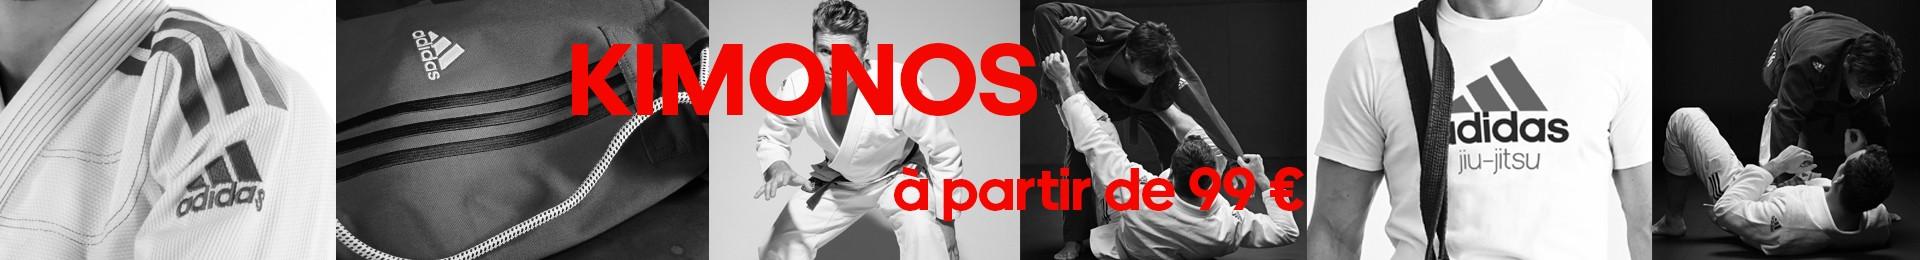 Les kimonos Jiu Jitsu brésiliens à partir de 99€